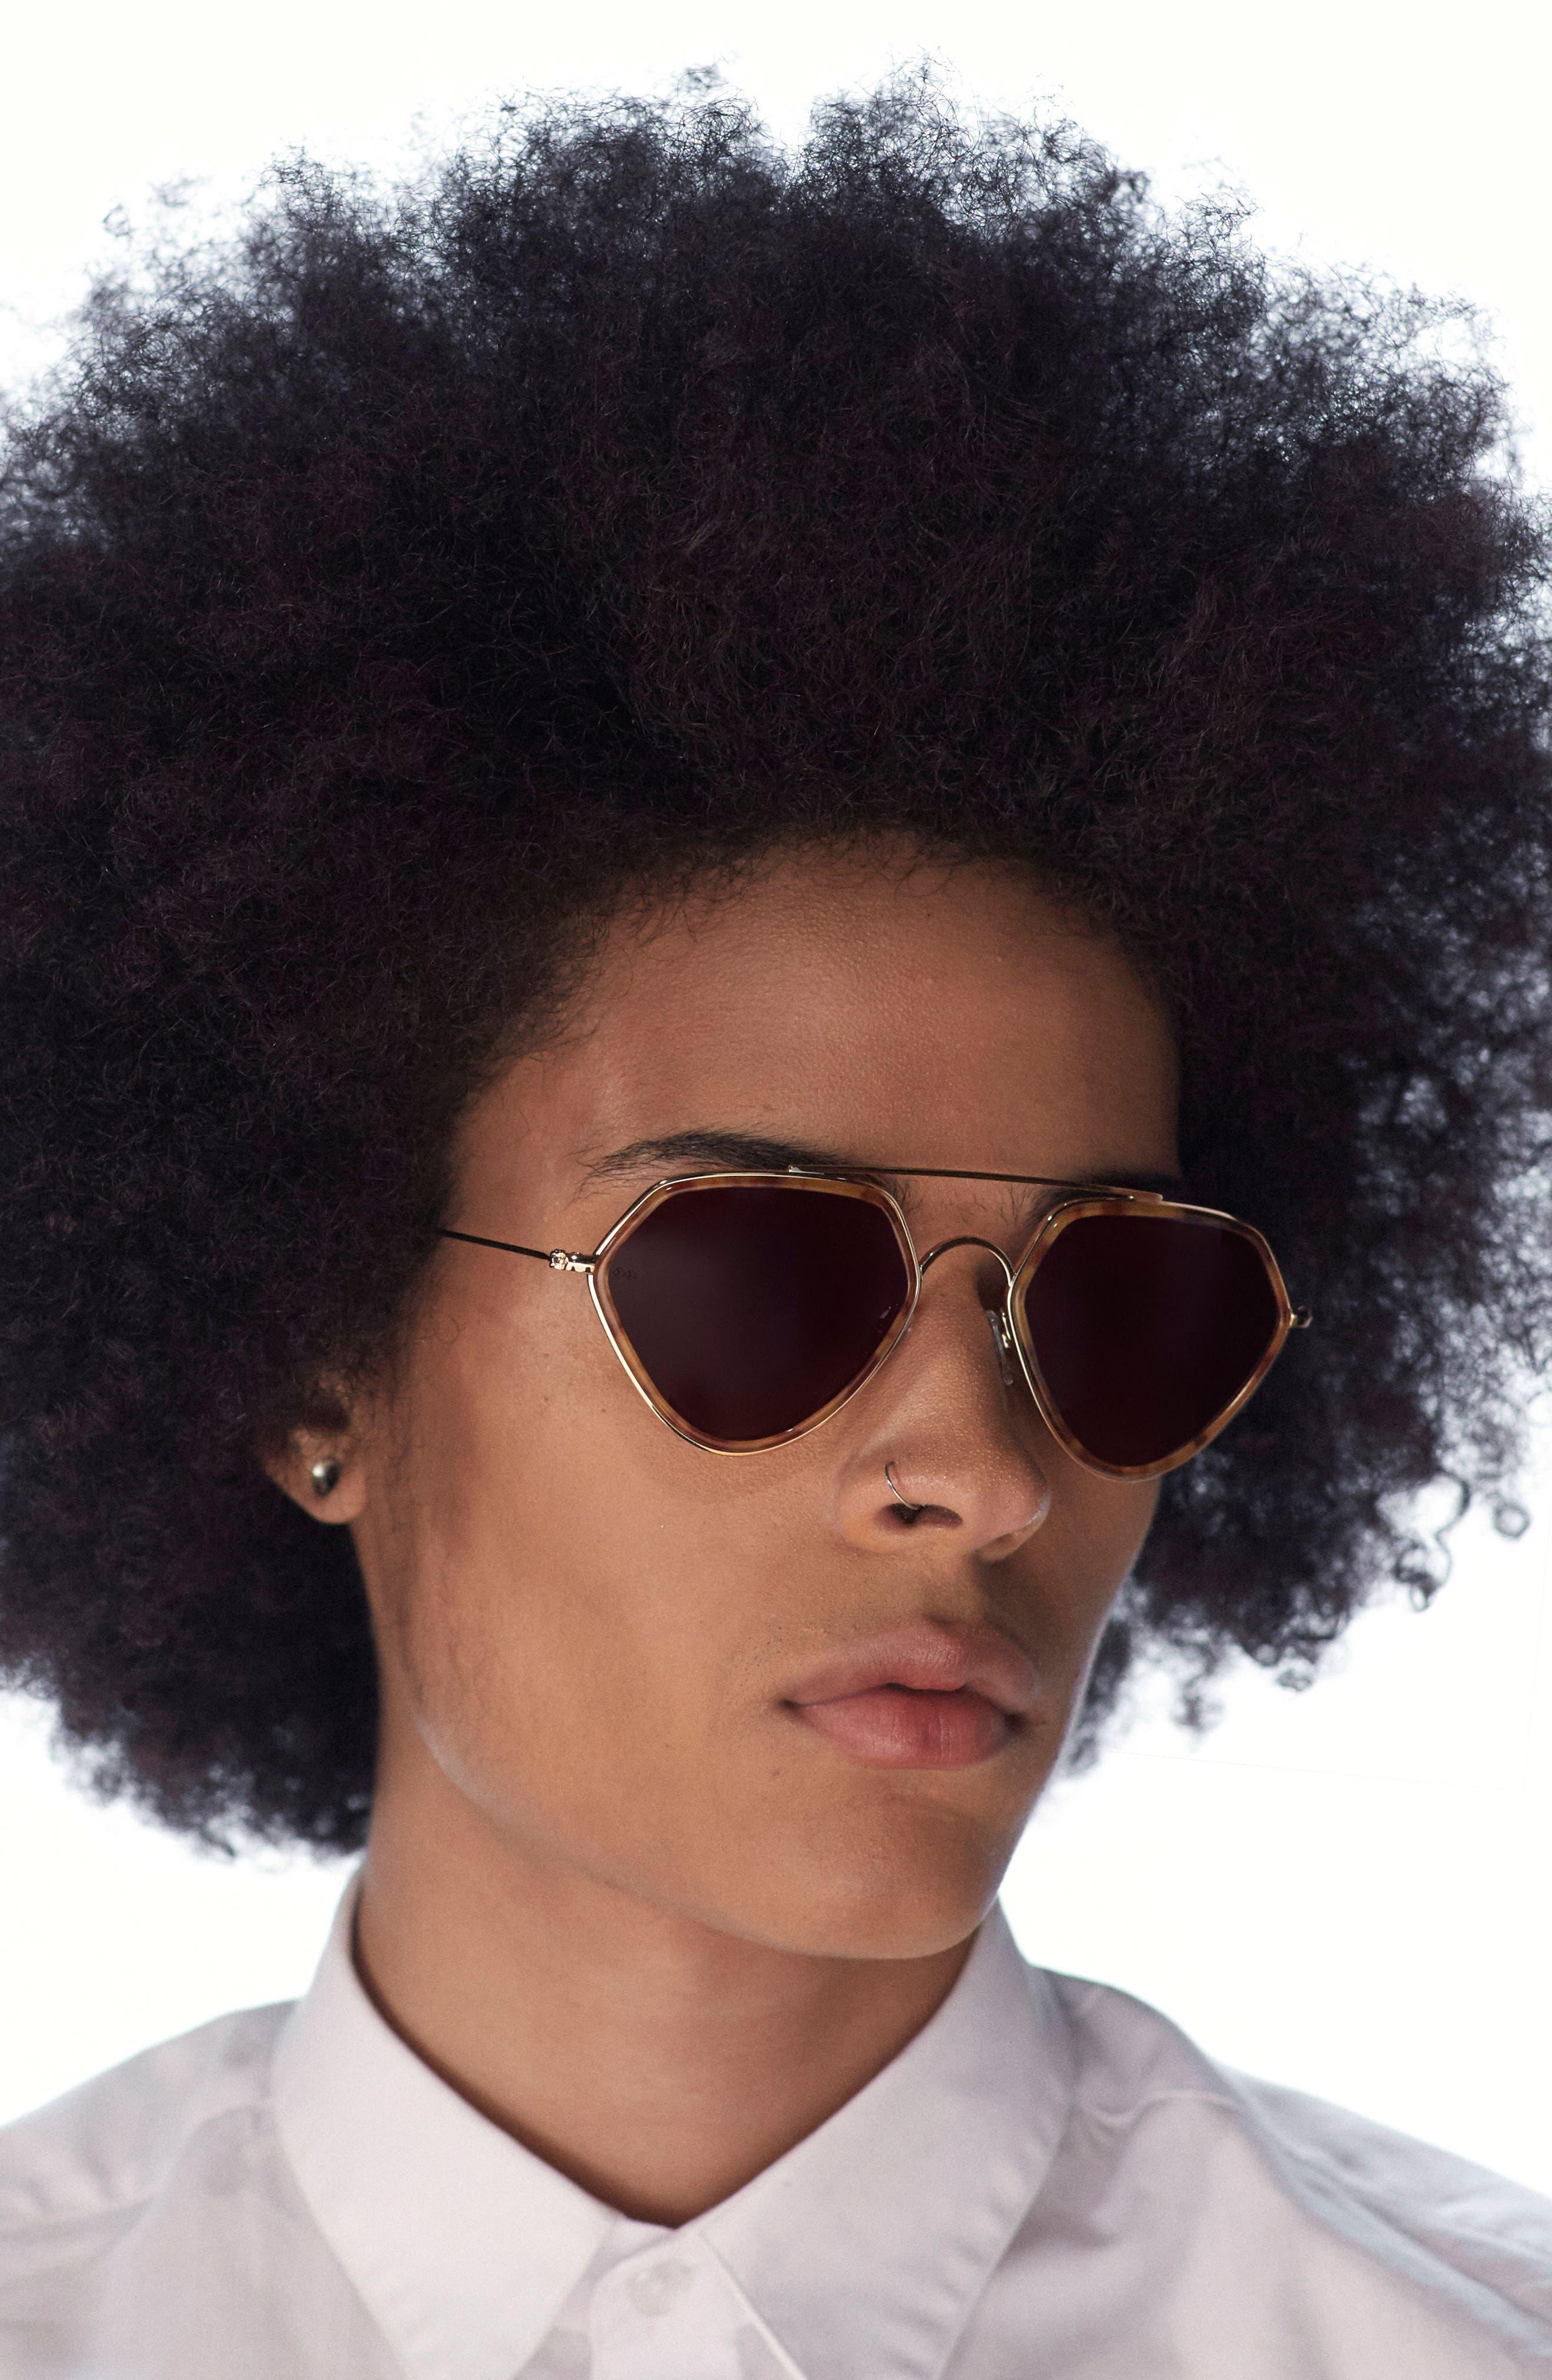 Geo 2 53mm Retro Sunglasses,                             Alternate thumbnail 2, color,                             206